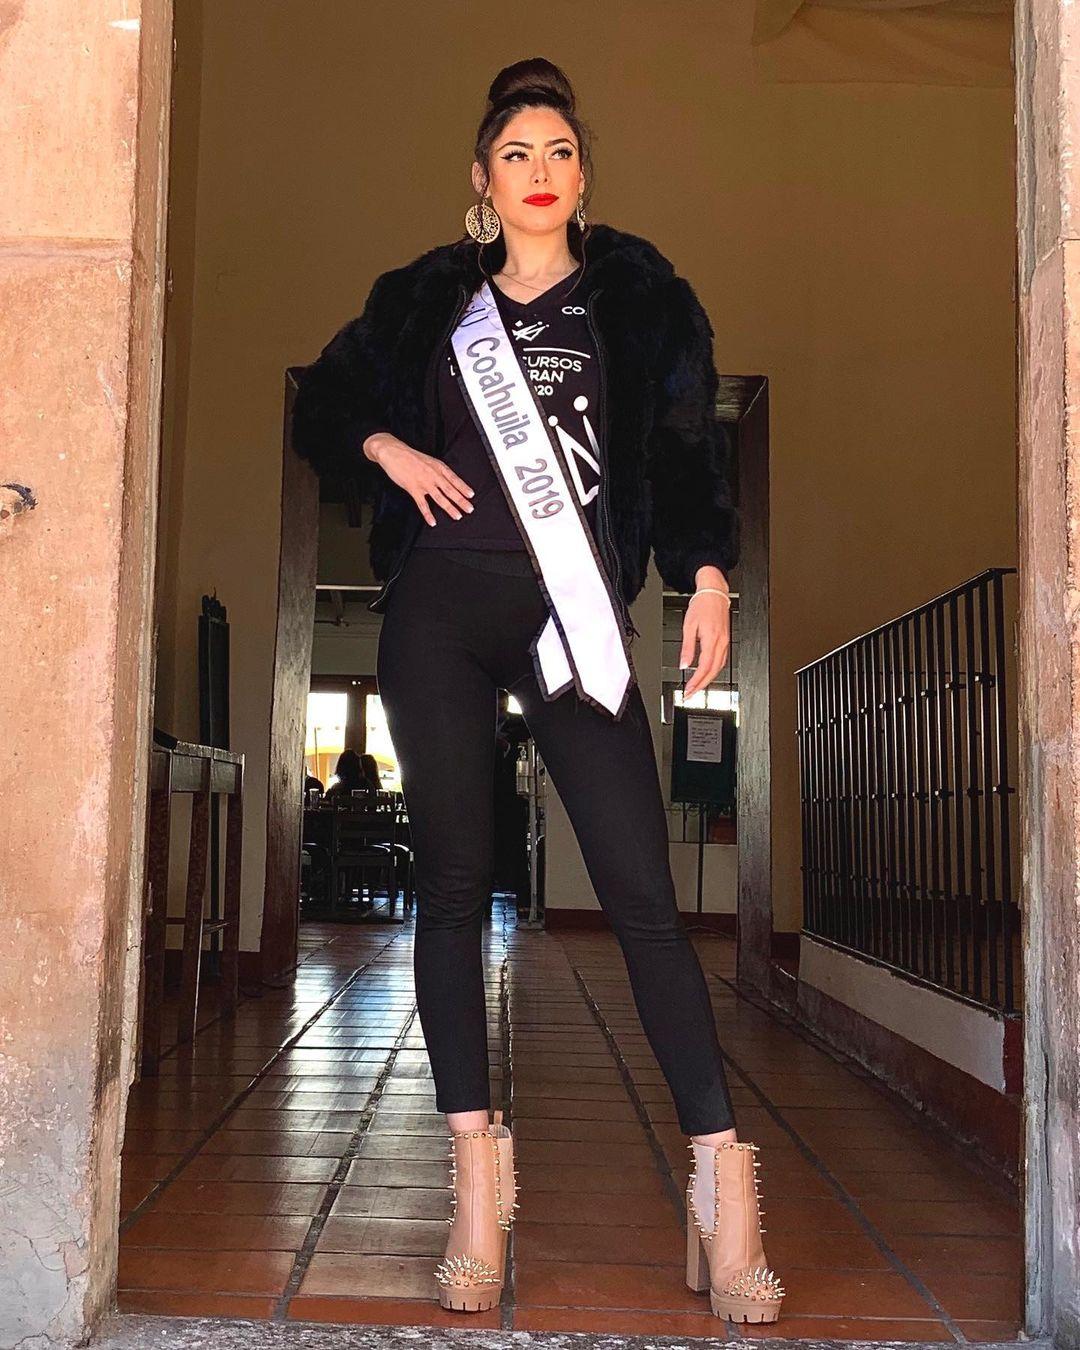 ana lucila linaje, mexicana universal coahuila 2020. - Página 3 Mxu_co16